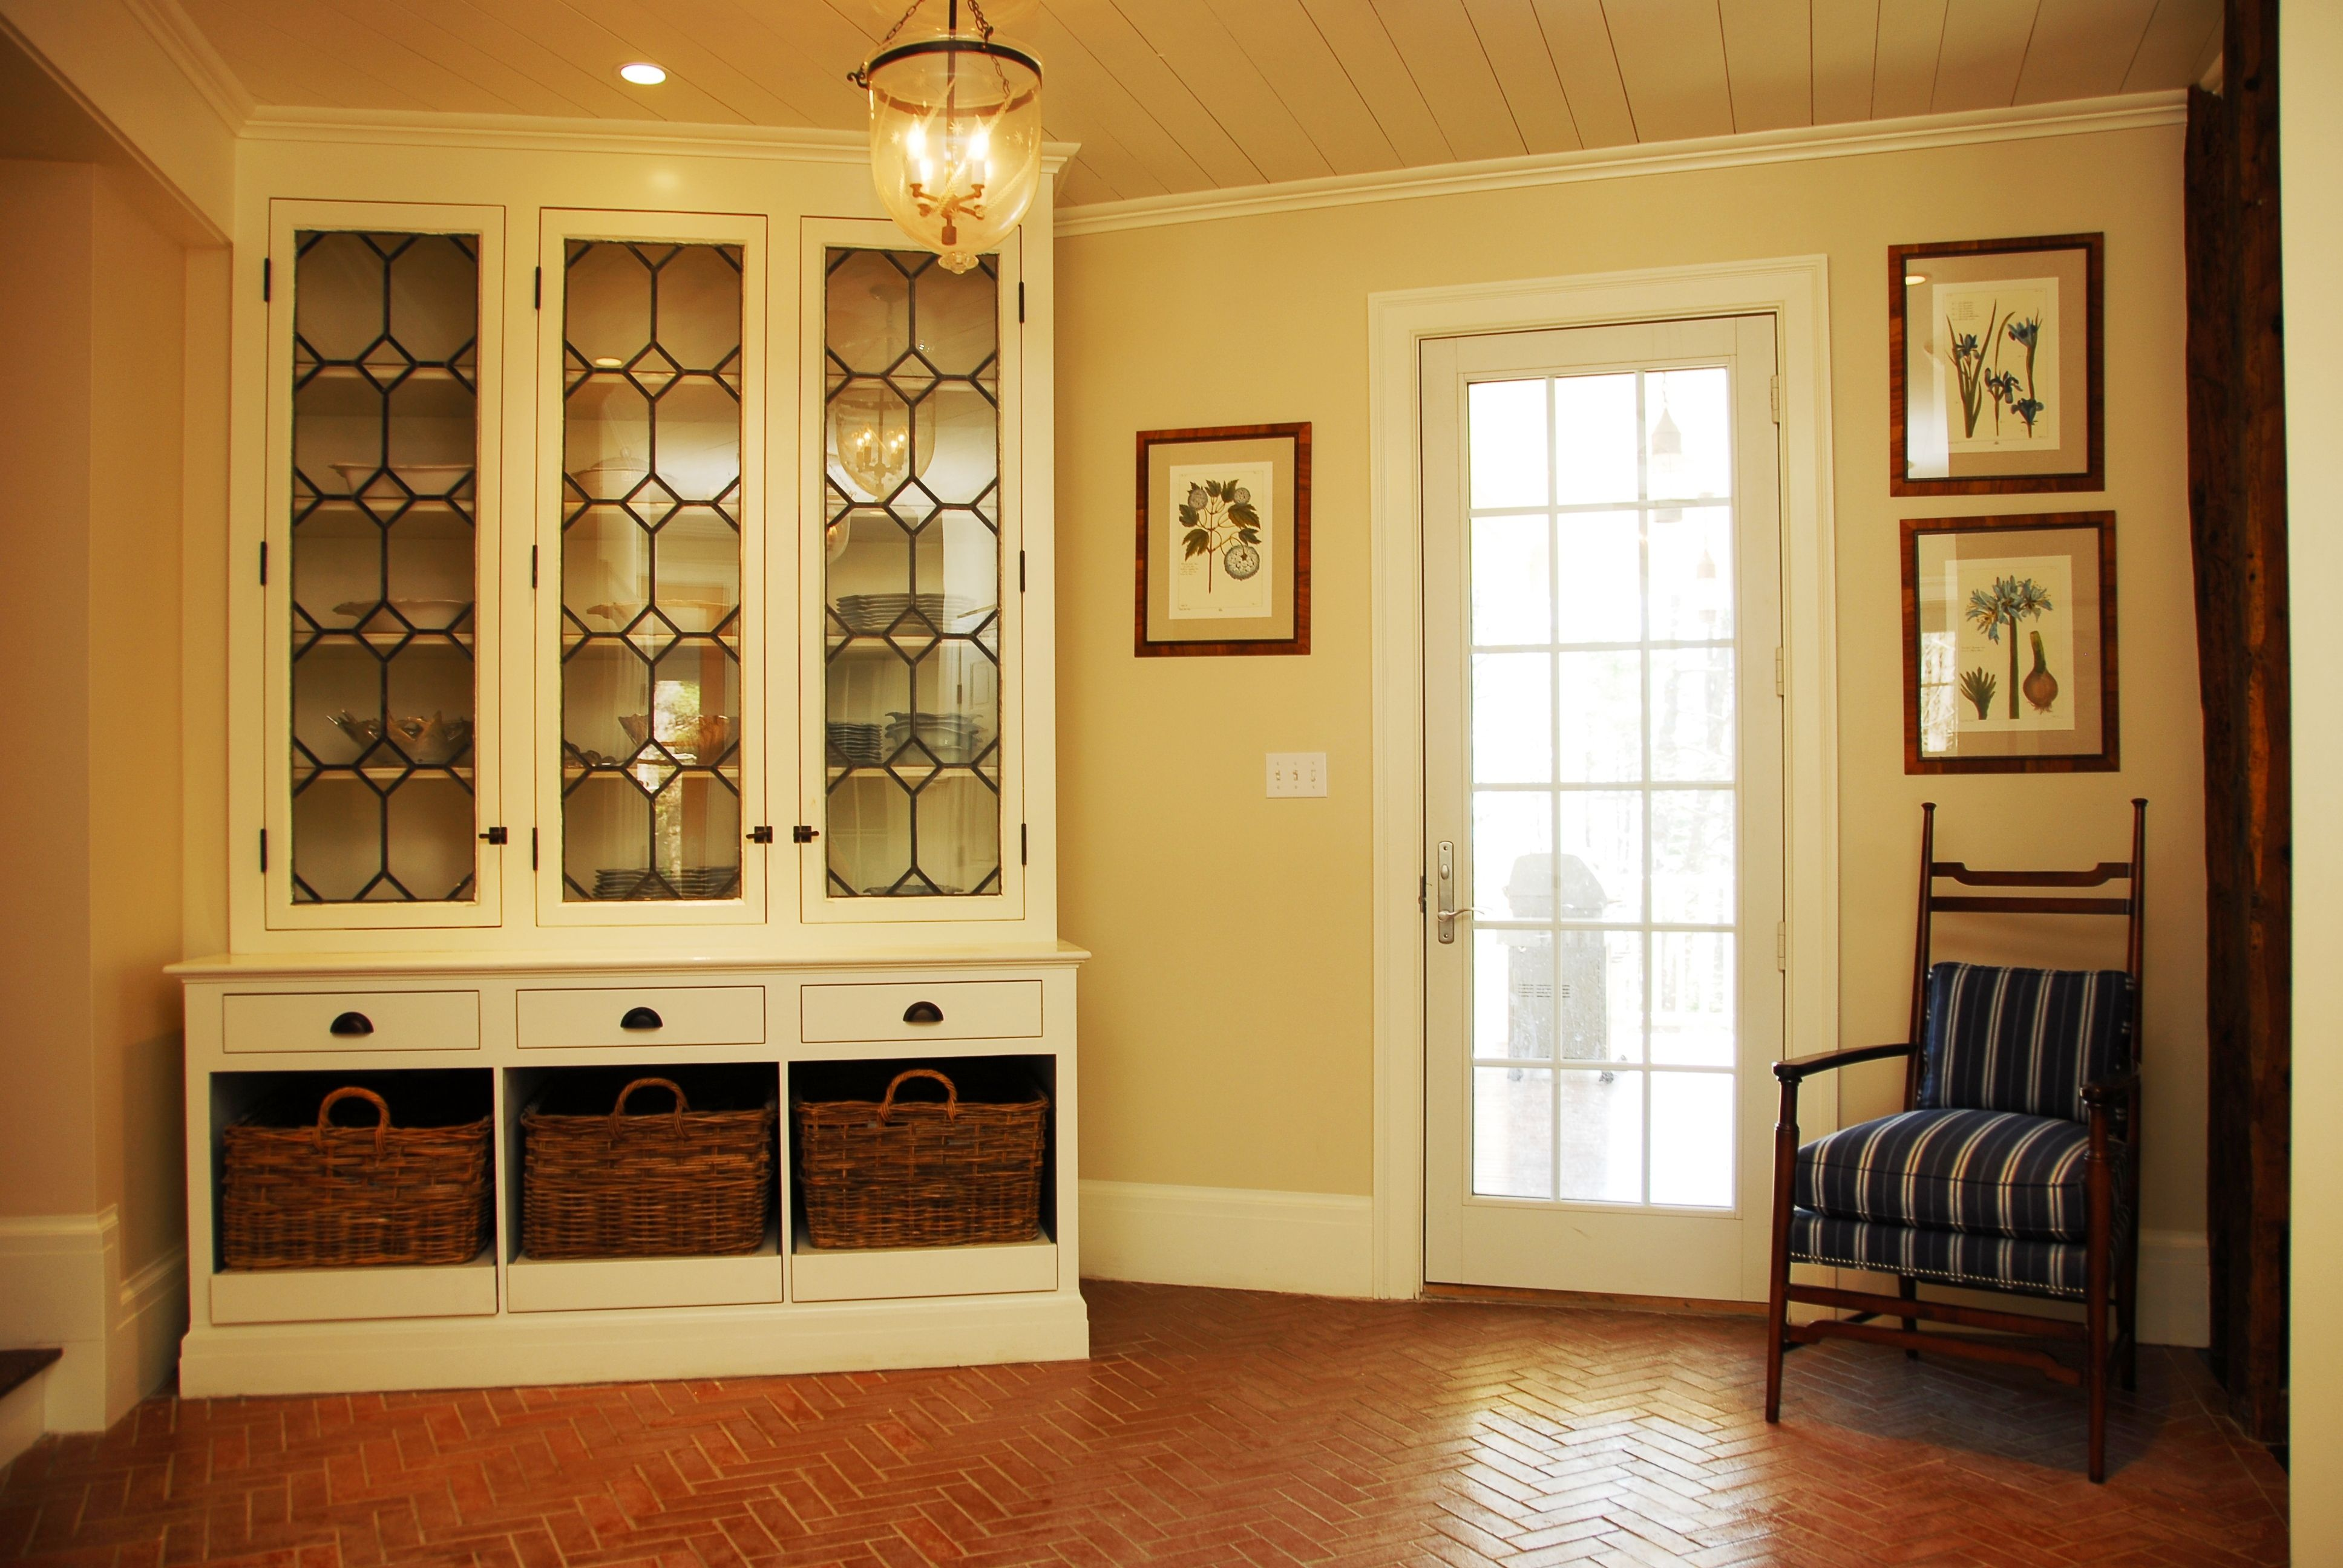 S Fe Custom Dining Room Cabinet: Custom Cabinet Using Salvaged Doors